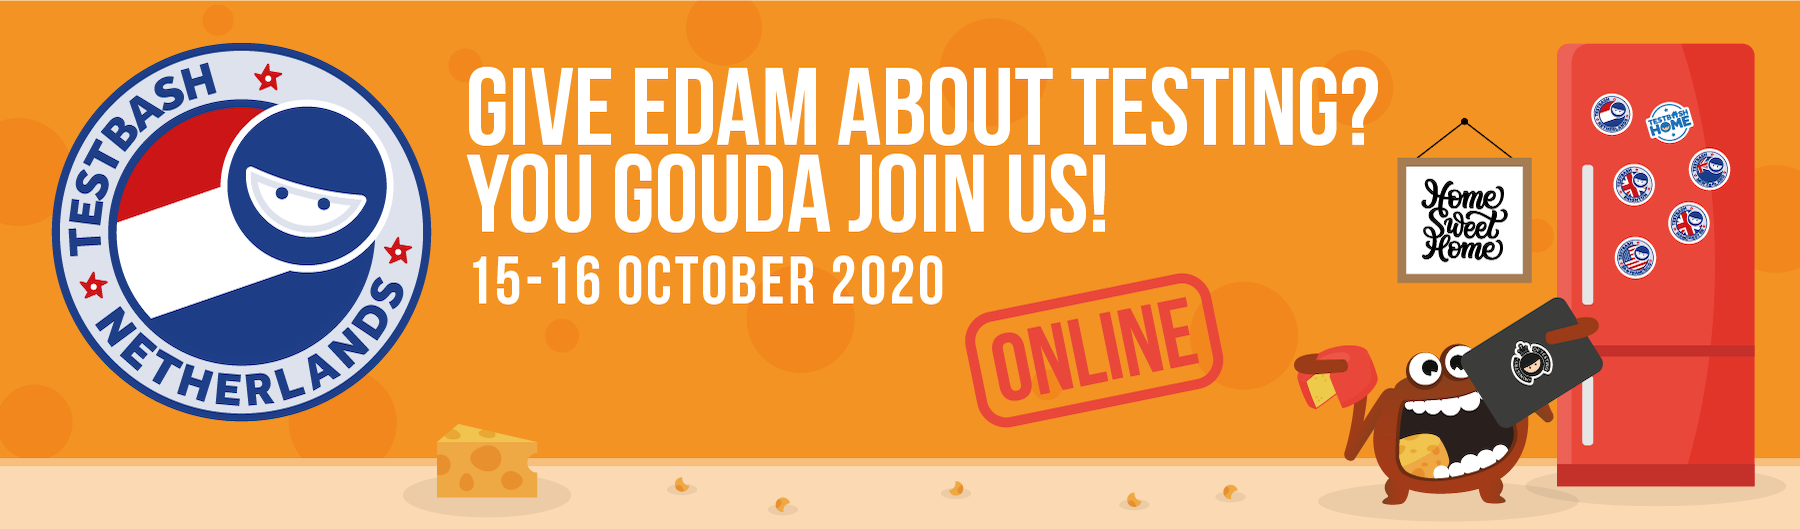 TestBash Netherlands Online - Conference Day